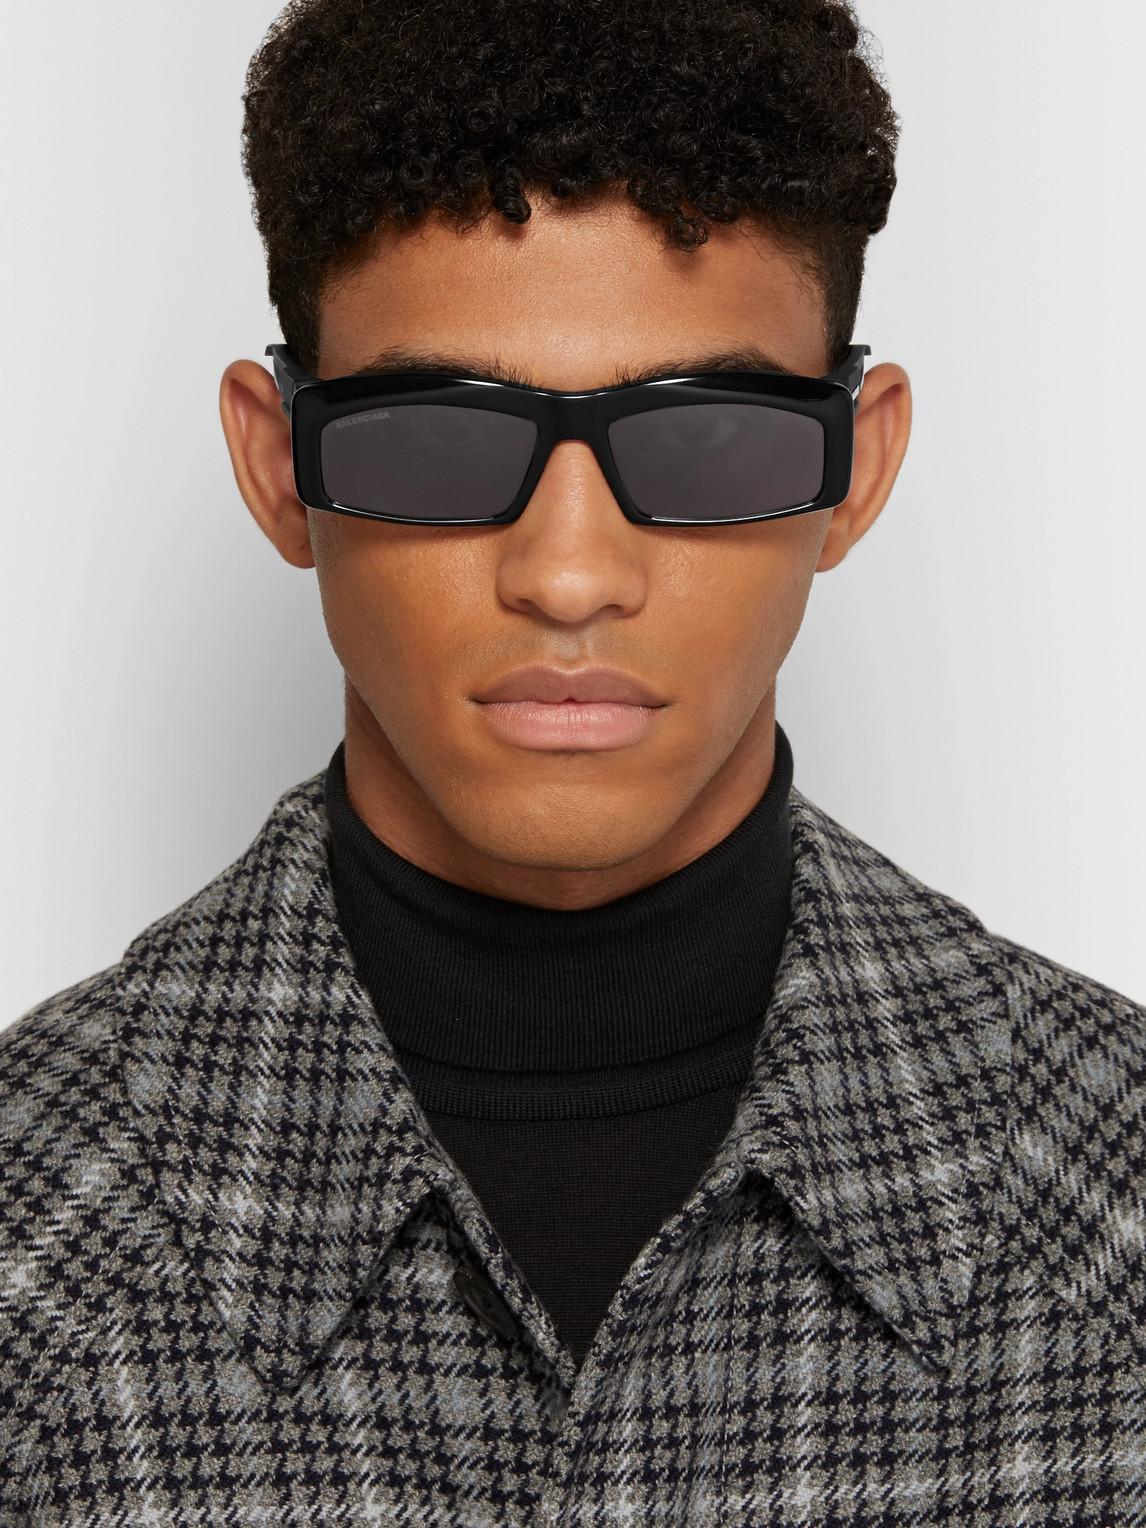 Balenciaga Sunglasses RECTANGLE-FRAME RUBBER-TRIMMED ACETATE SUNGLASSES